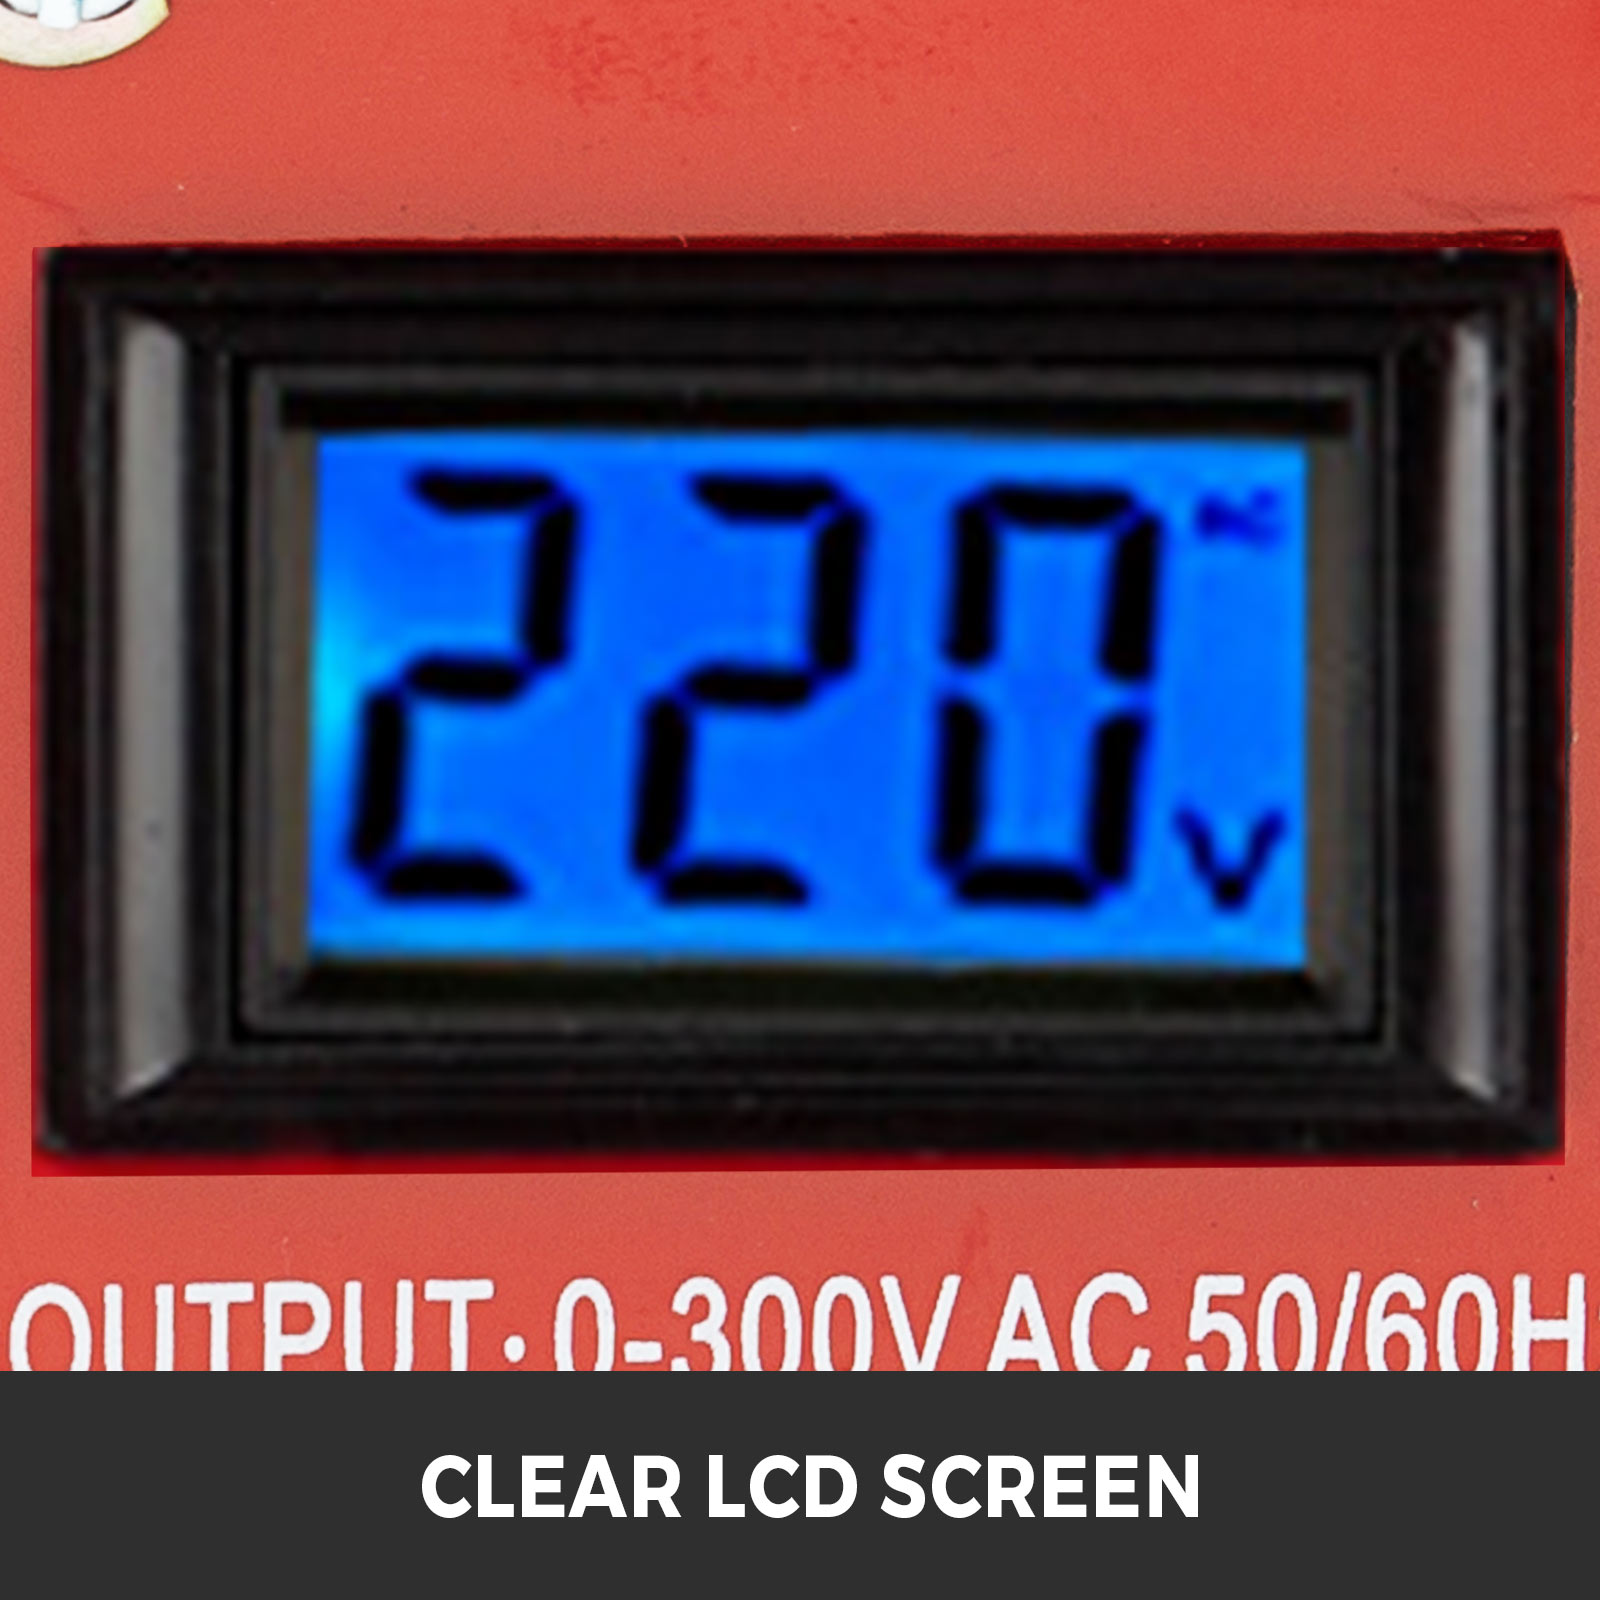 Auto-Variac-Variable-Transformer-0-5-1-2-3KVA-Regulator-pure-copper-coil-220V thumbnail 64